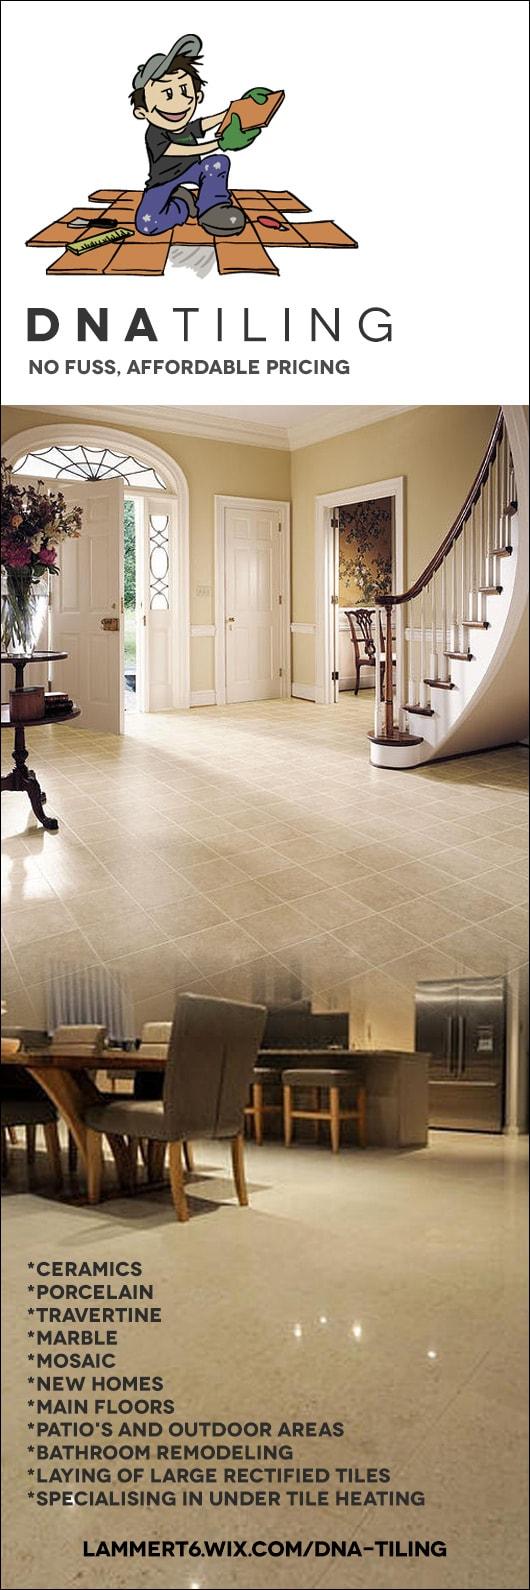 Dna tiling contractors wall floor tilers 17 ridgeview rd dna tiling contractors promotion dailygadgetfo Choice Image